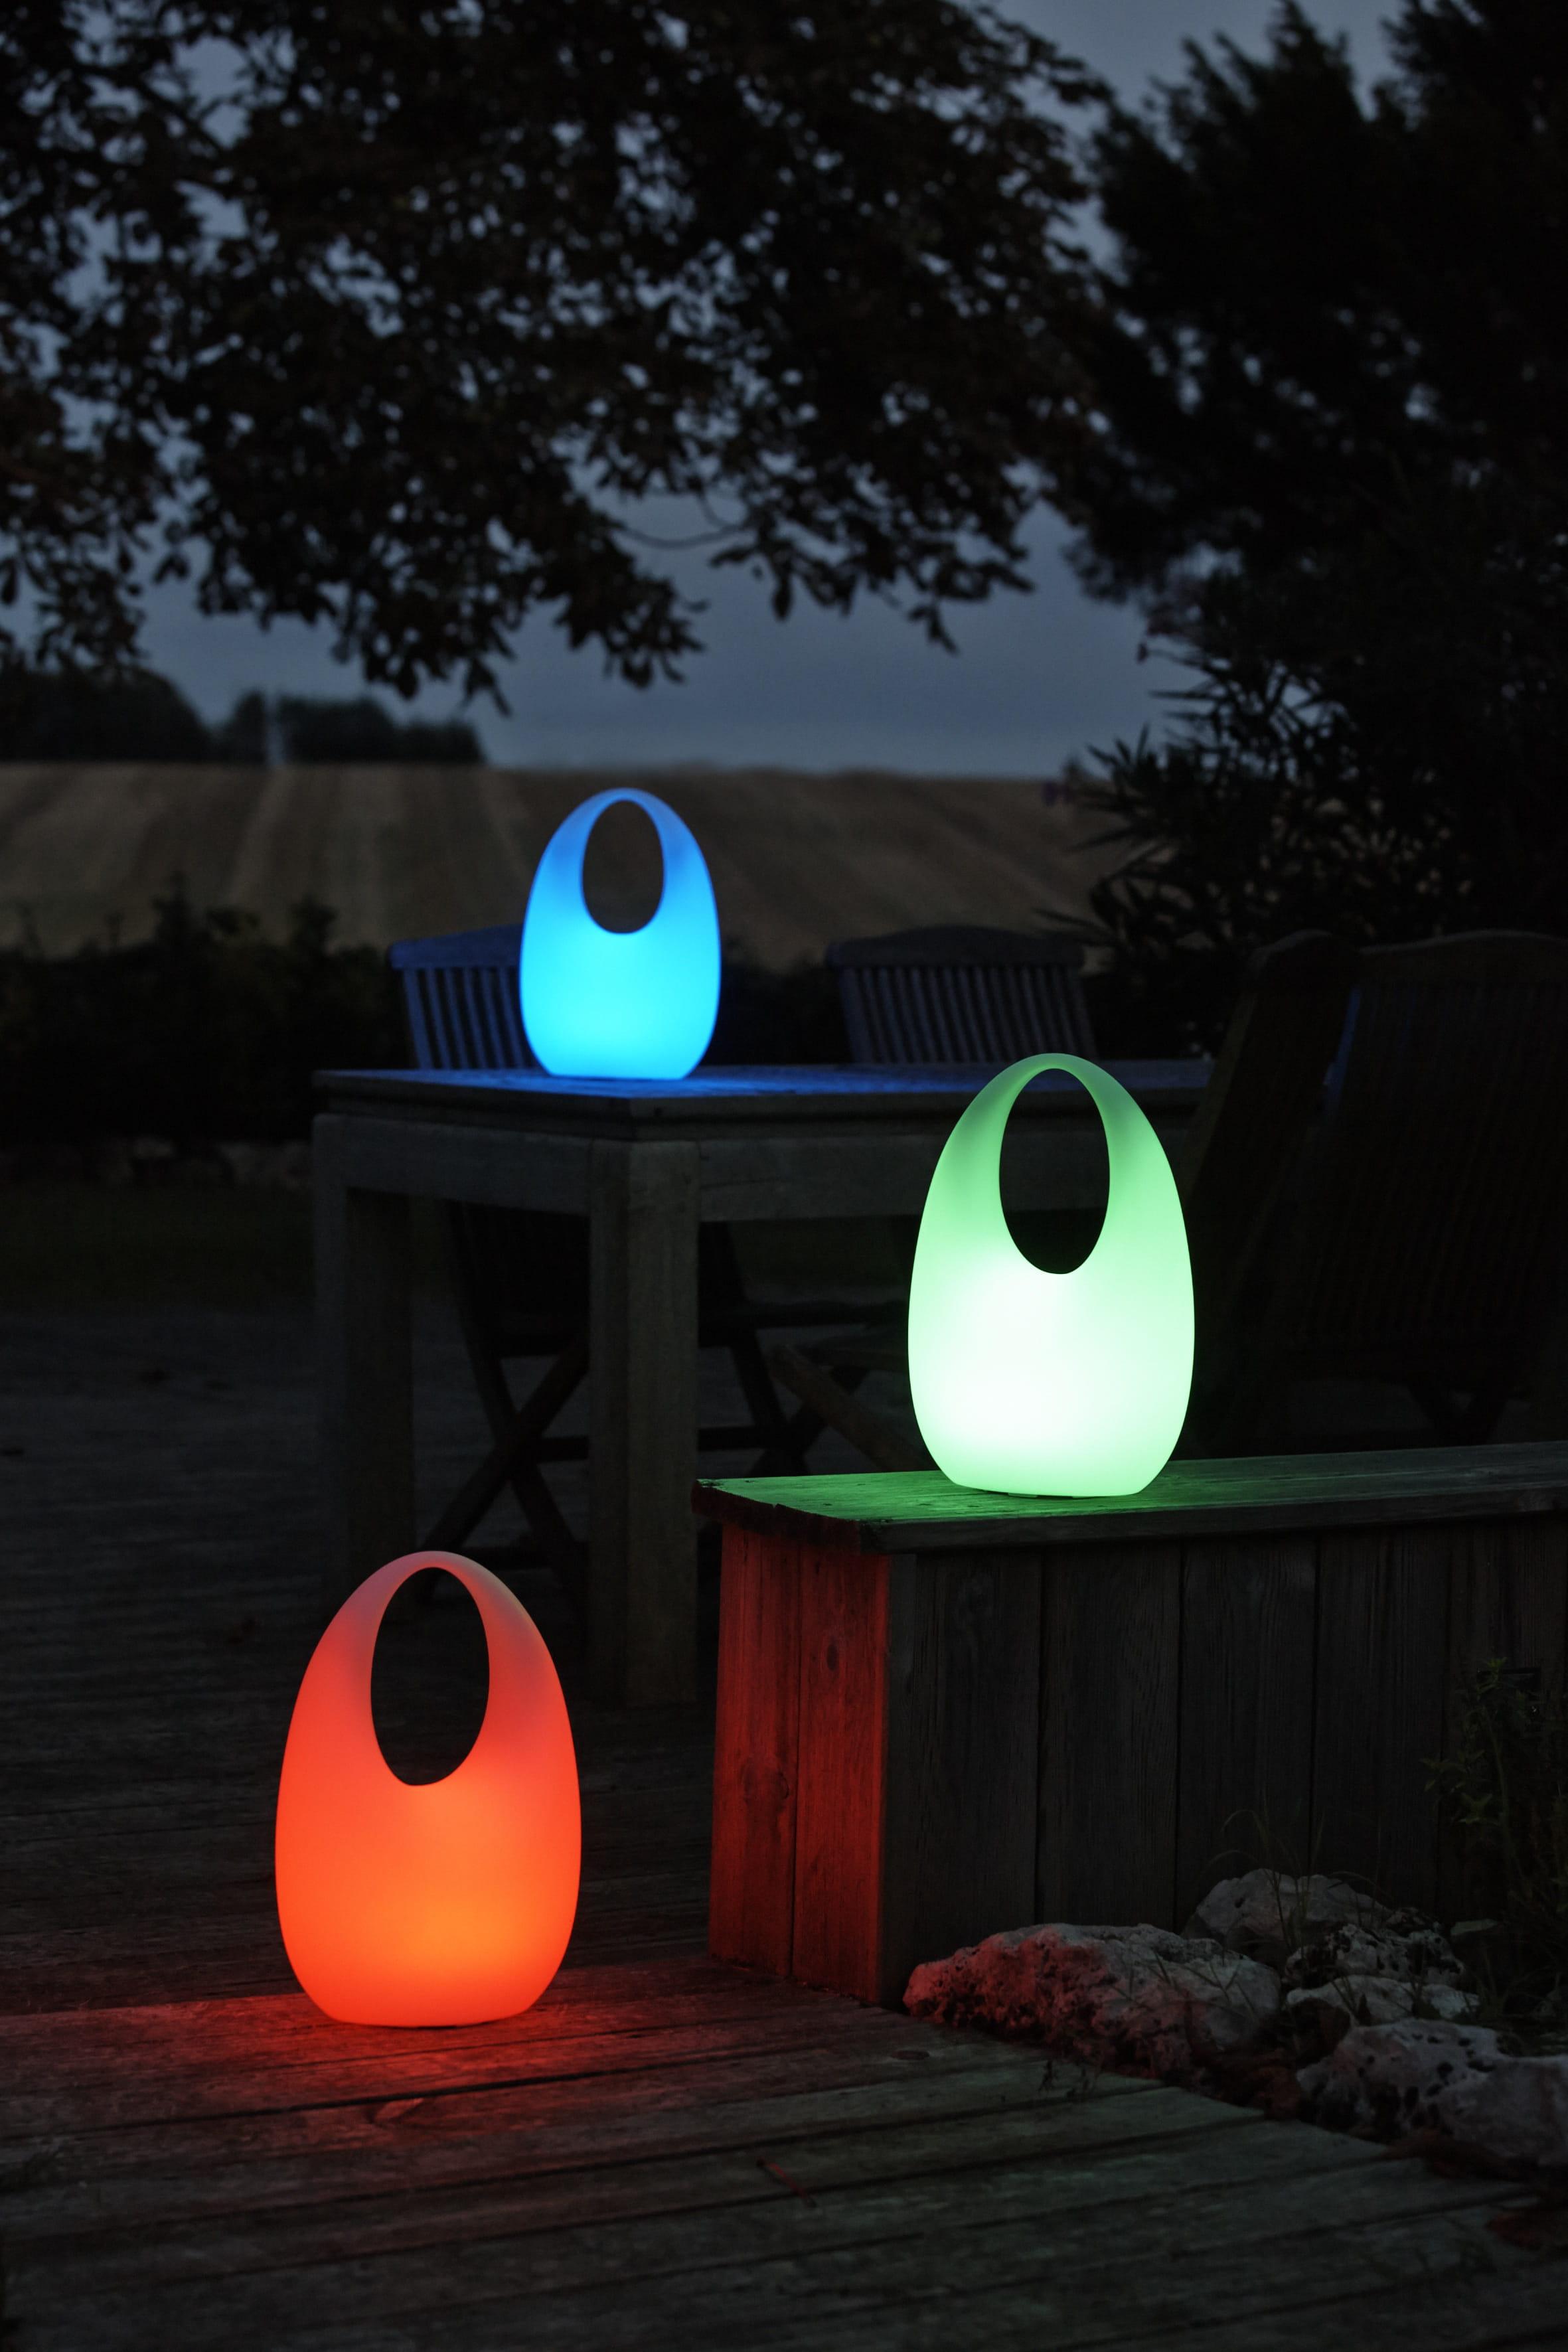 Lampes nomade de gifi clairer son jardin avec style - Guirlande lumineuse exterieur castorama ...